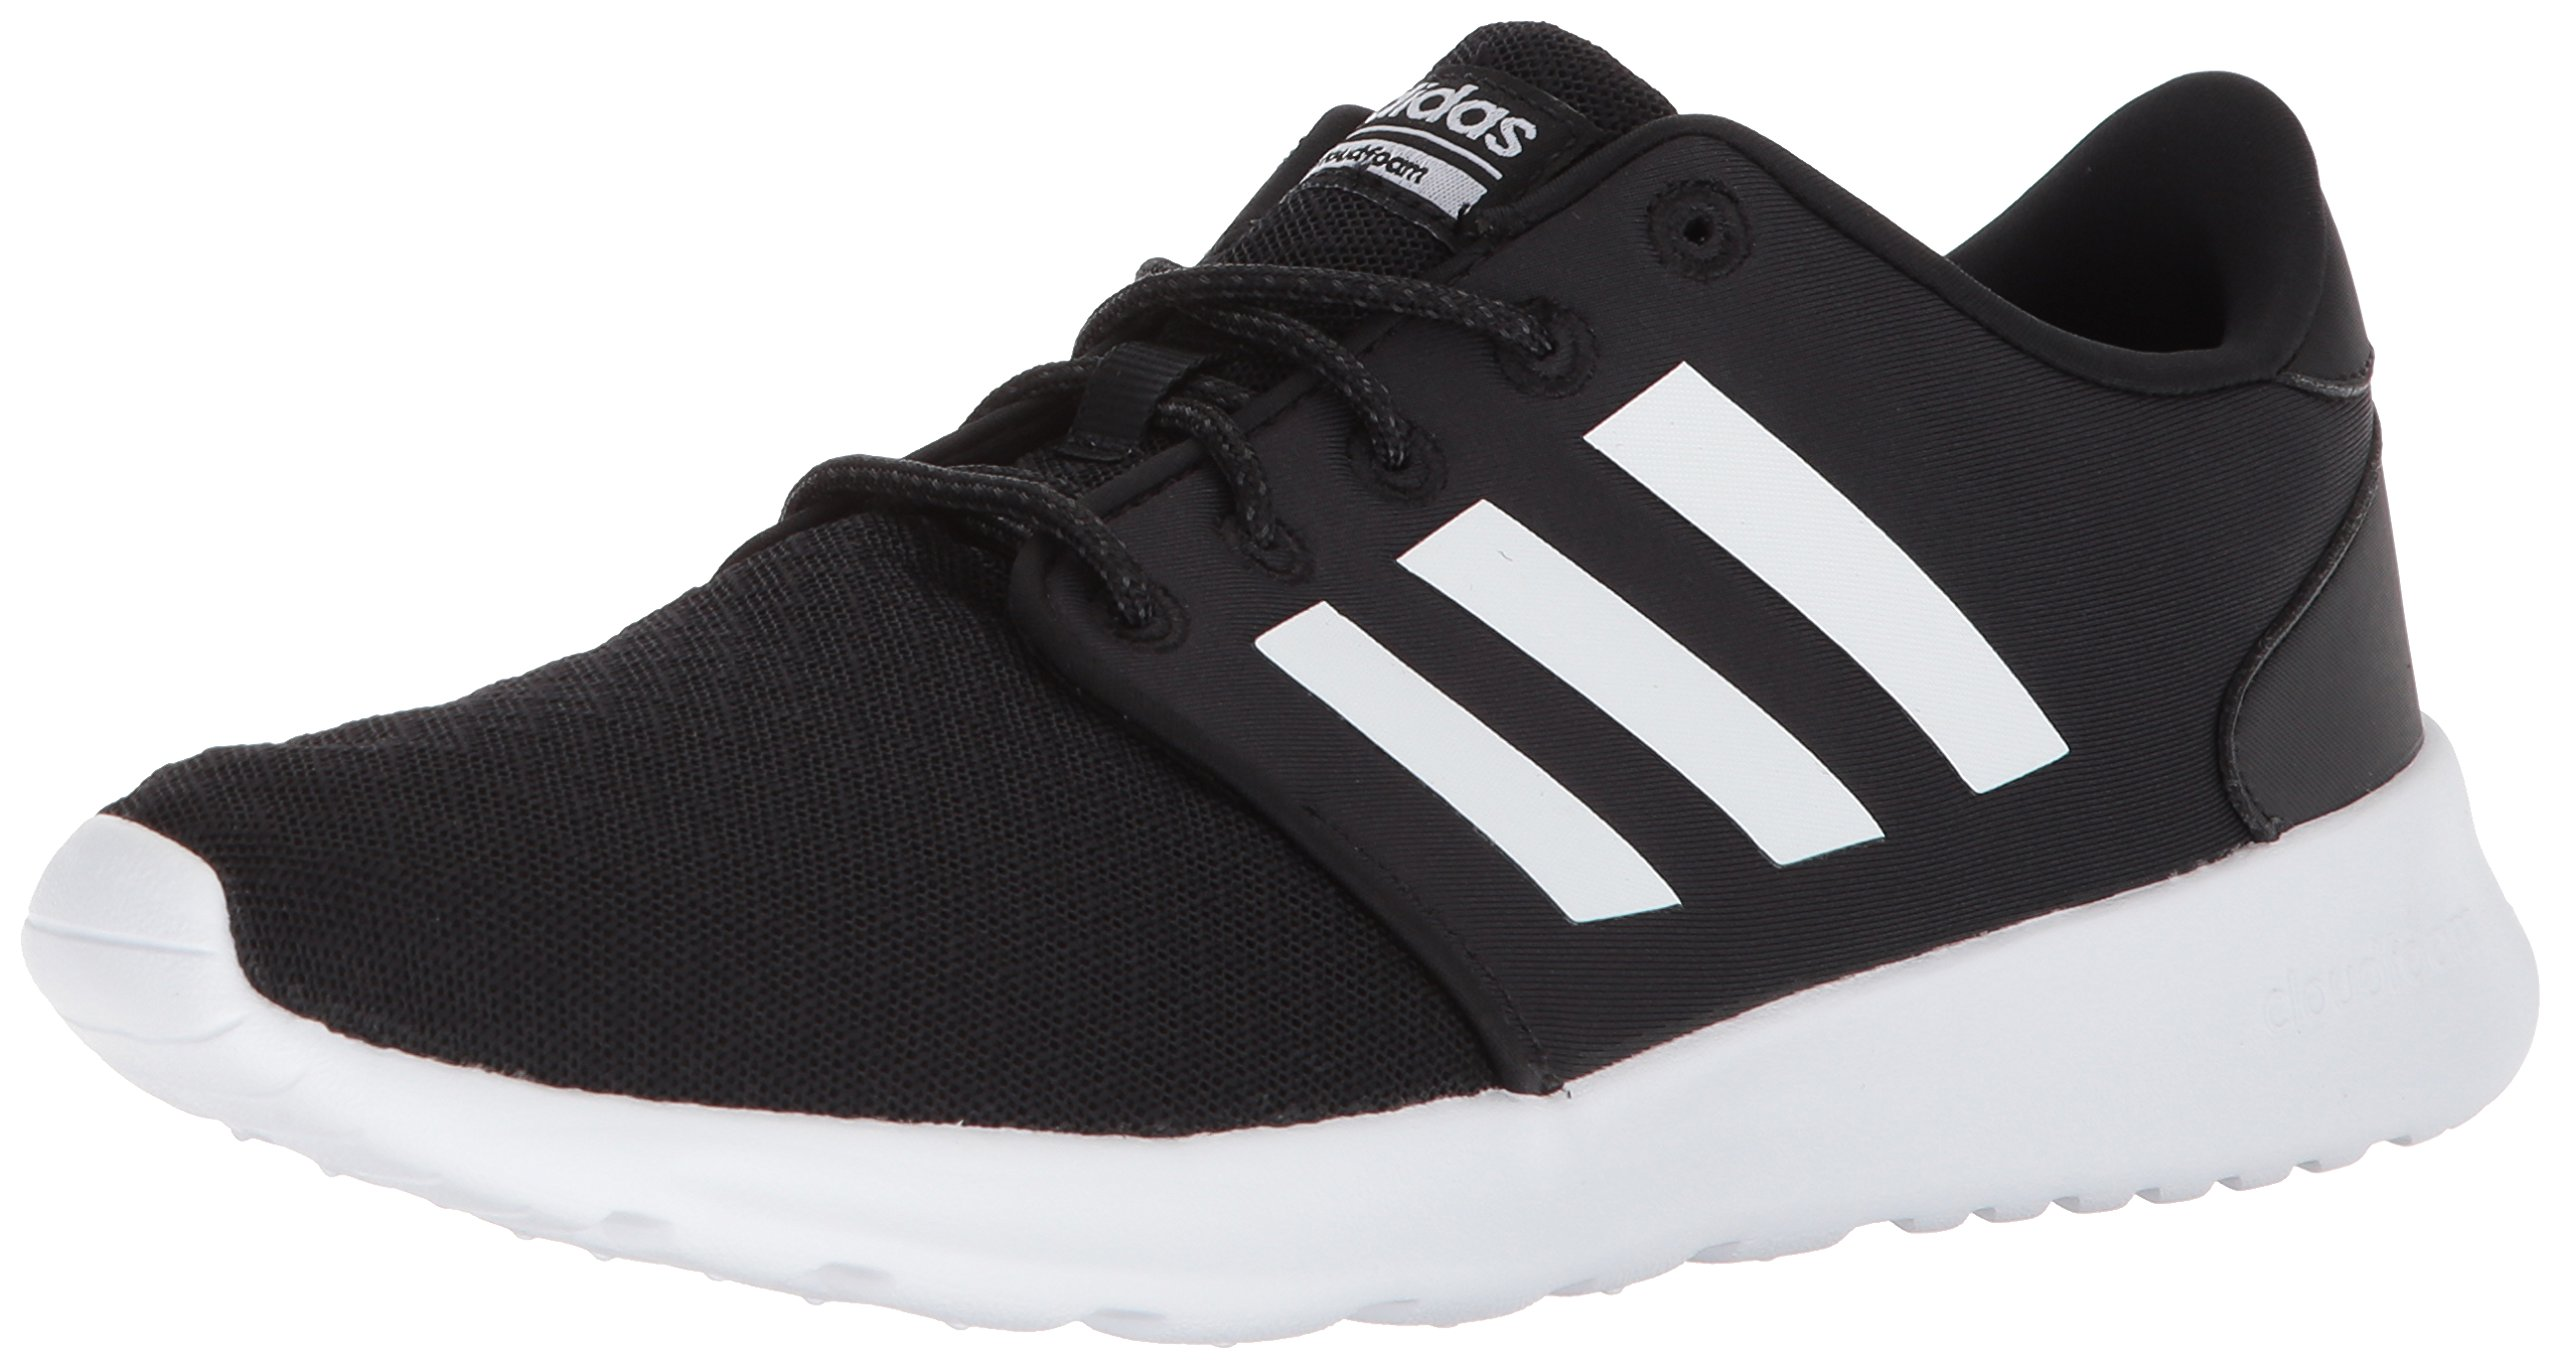 adidas Women's Cloudfoam QT Racer Running Shoe, Black/White/Carbon, 9 M US by adidas